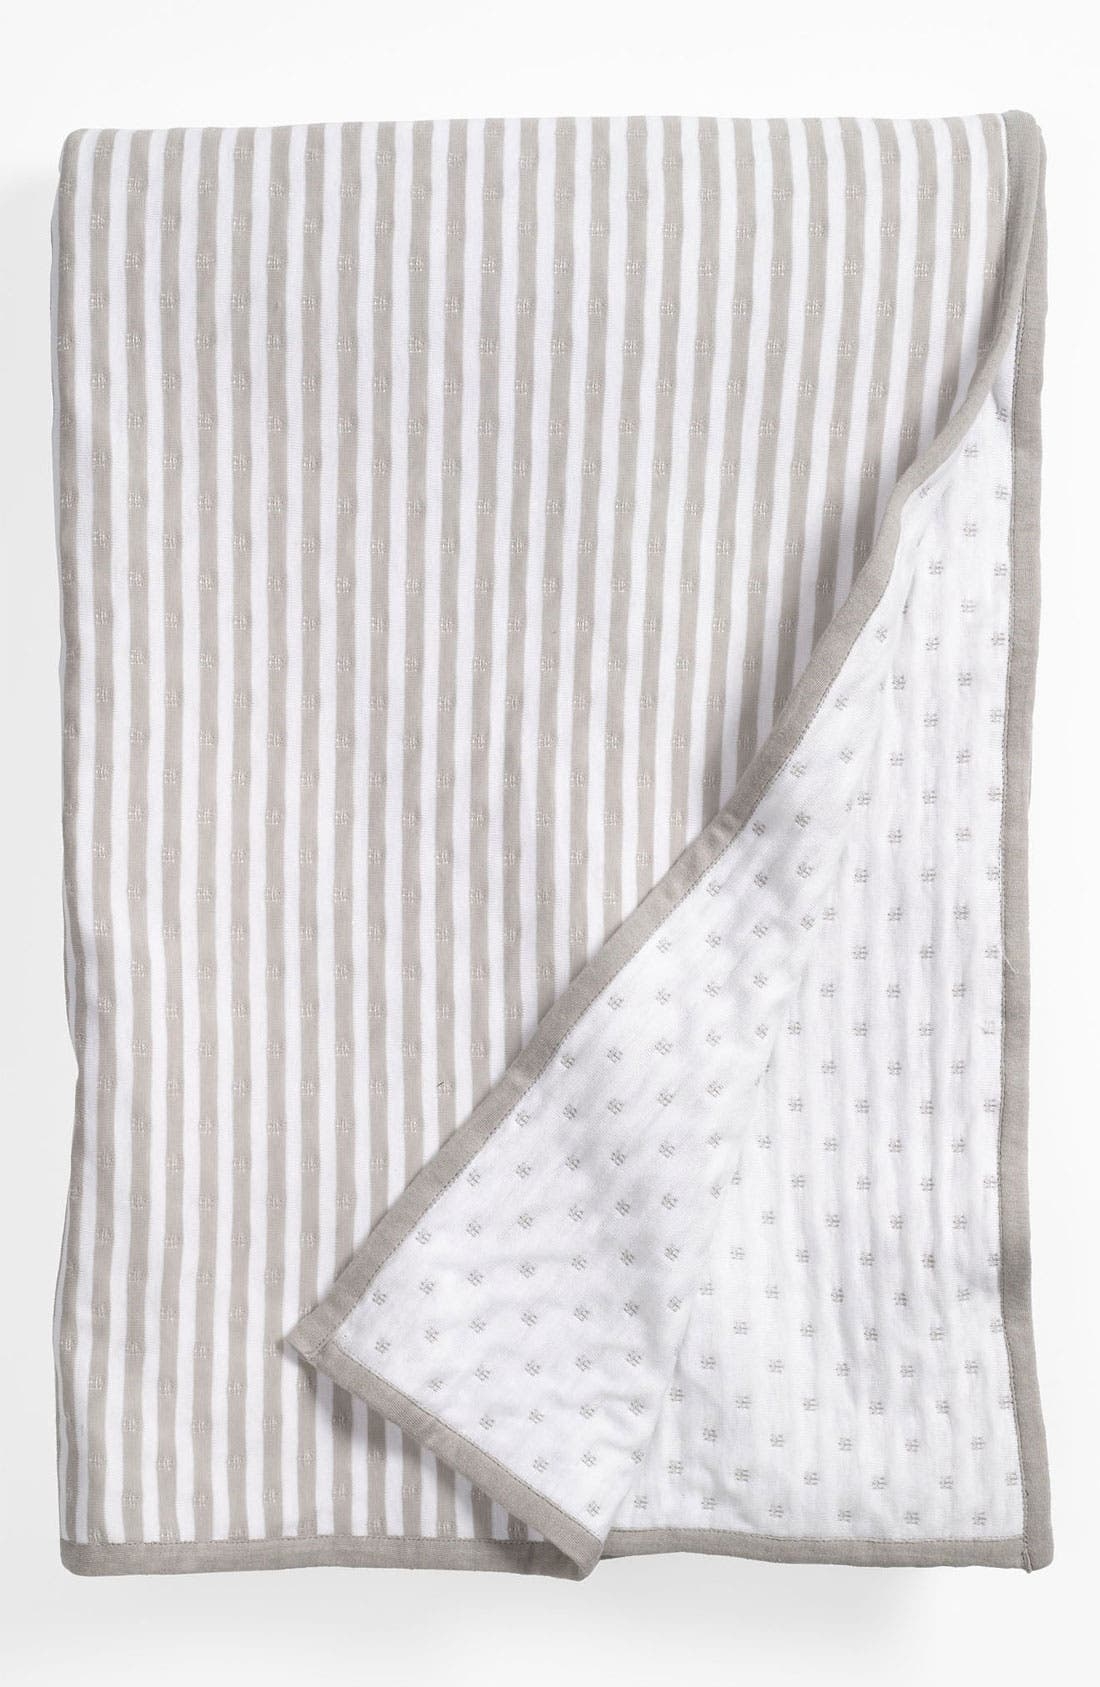 Alternate Image 1 Selected - Nordstrom at Home 'Stargazer' Reversible Blanket